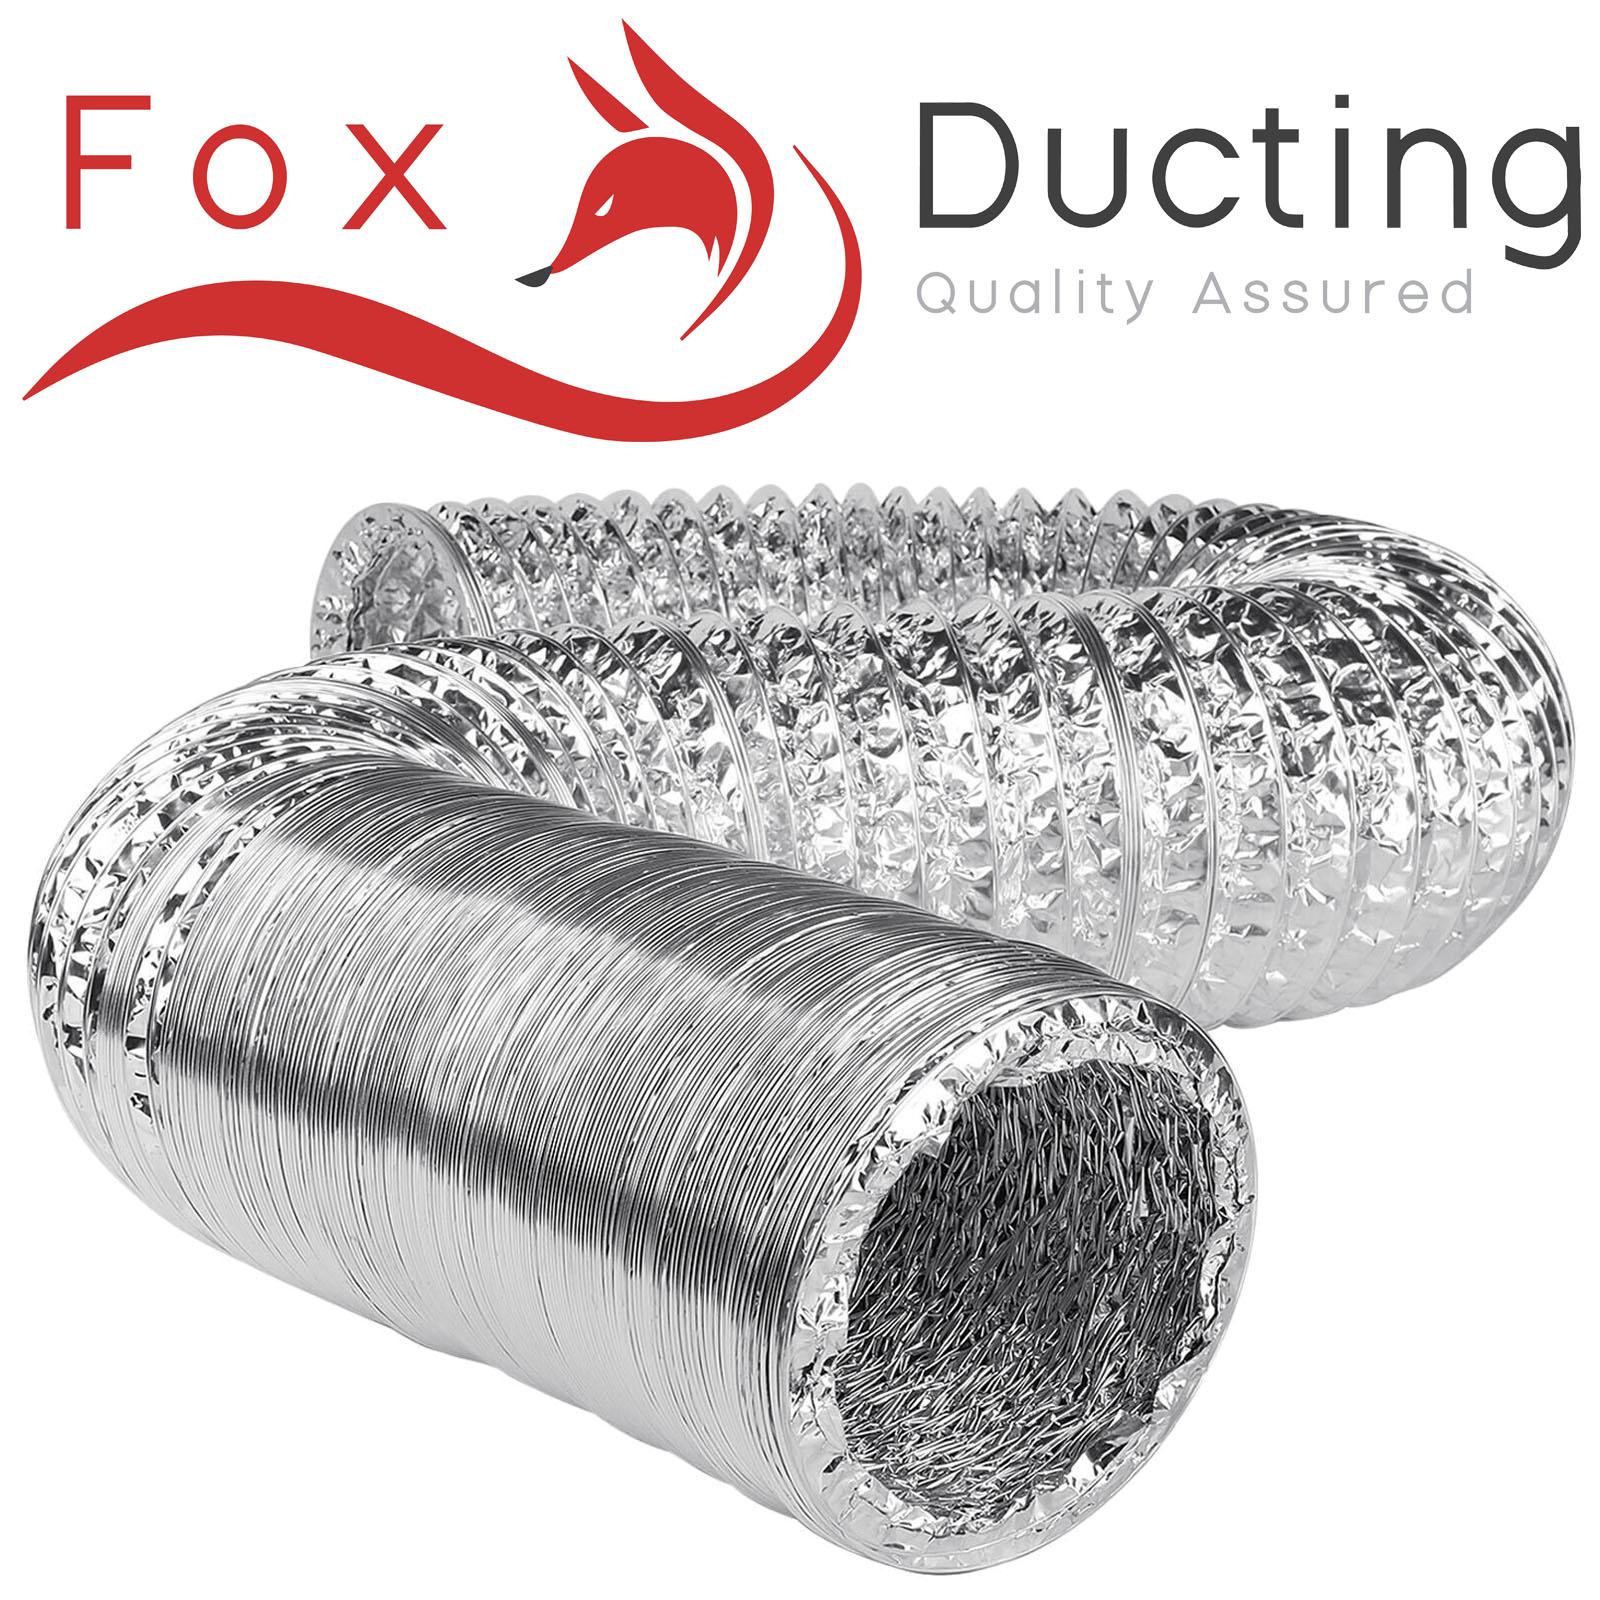 150MM 6INCH FLEXIBLE DUCTING VENTILATION EXTRACTOR FAN HYDROPONIC Aluminium foil